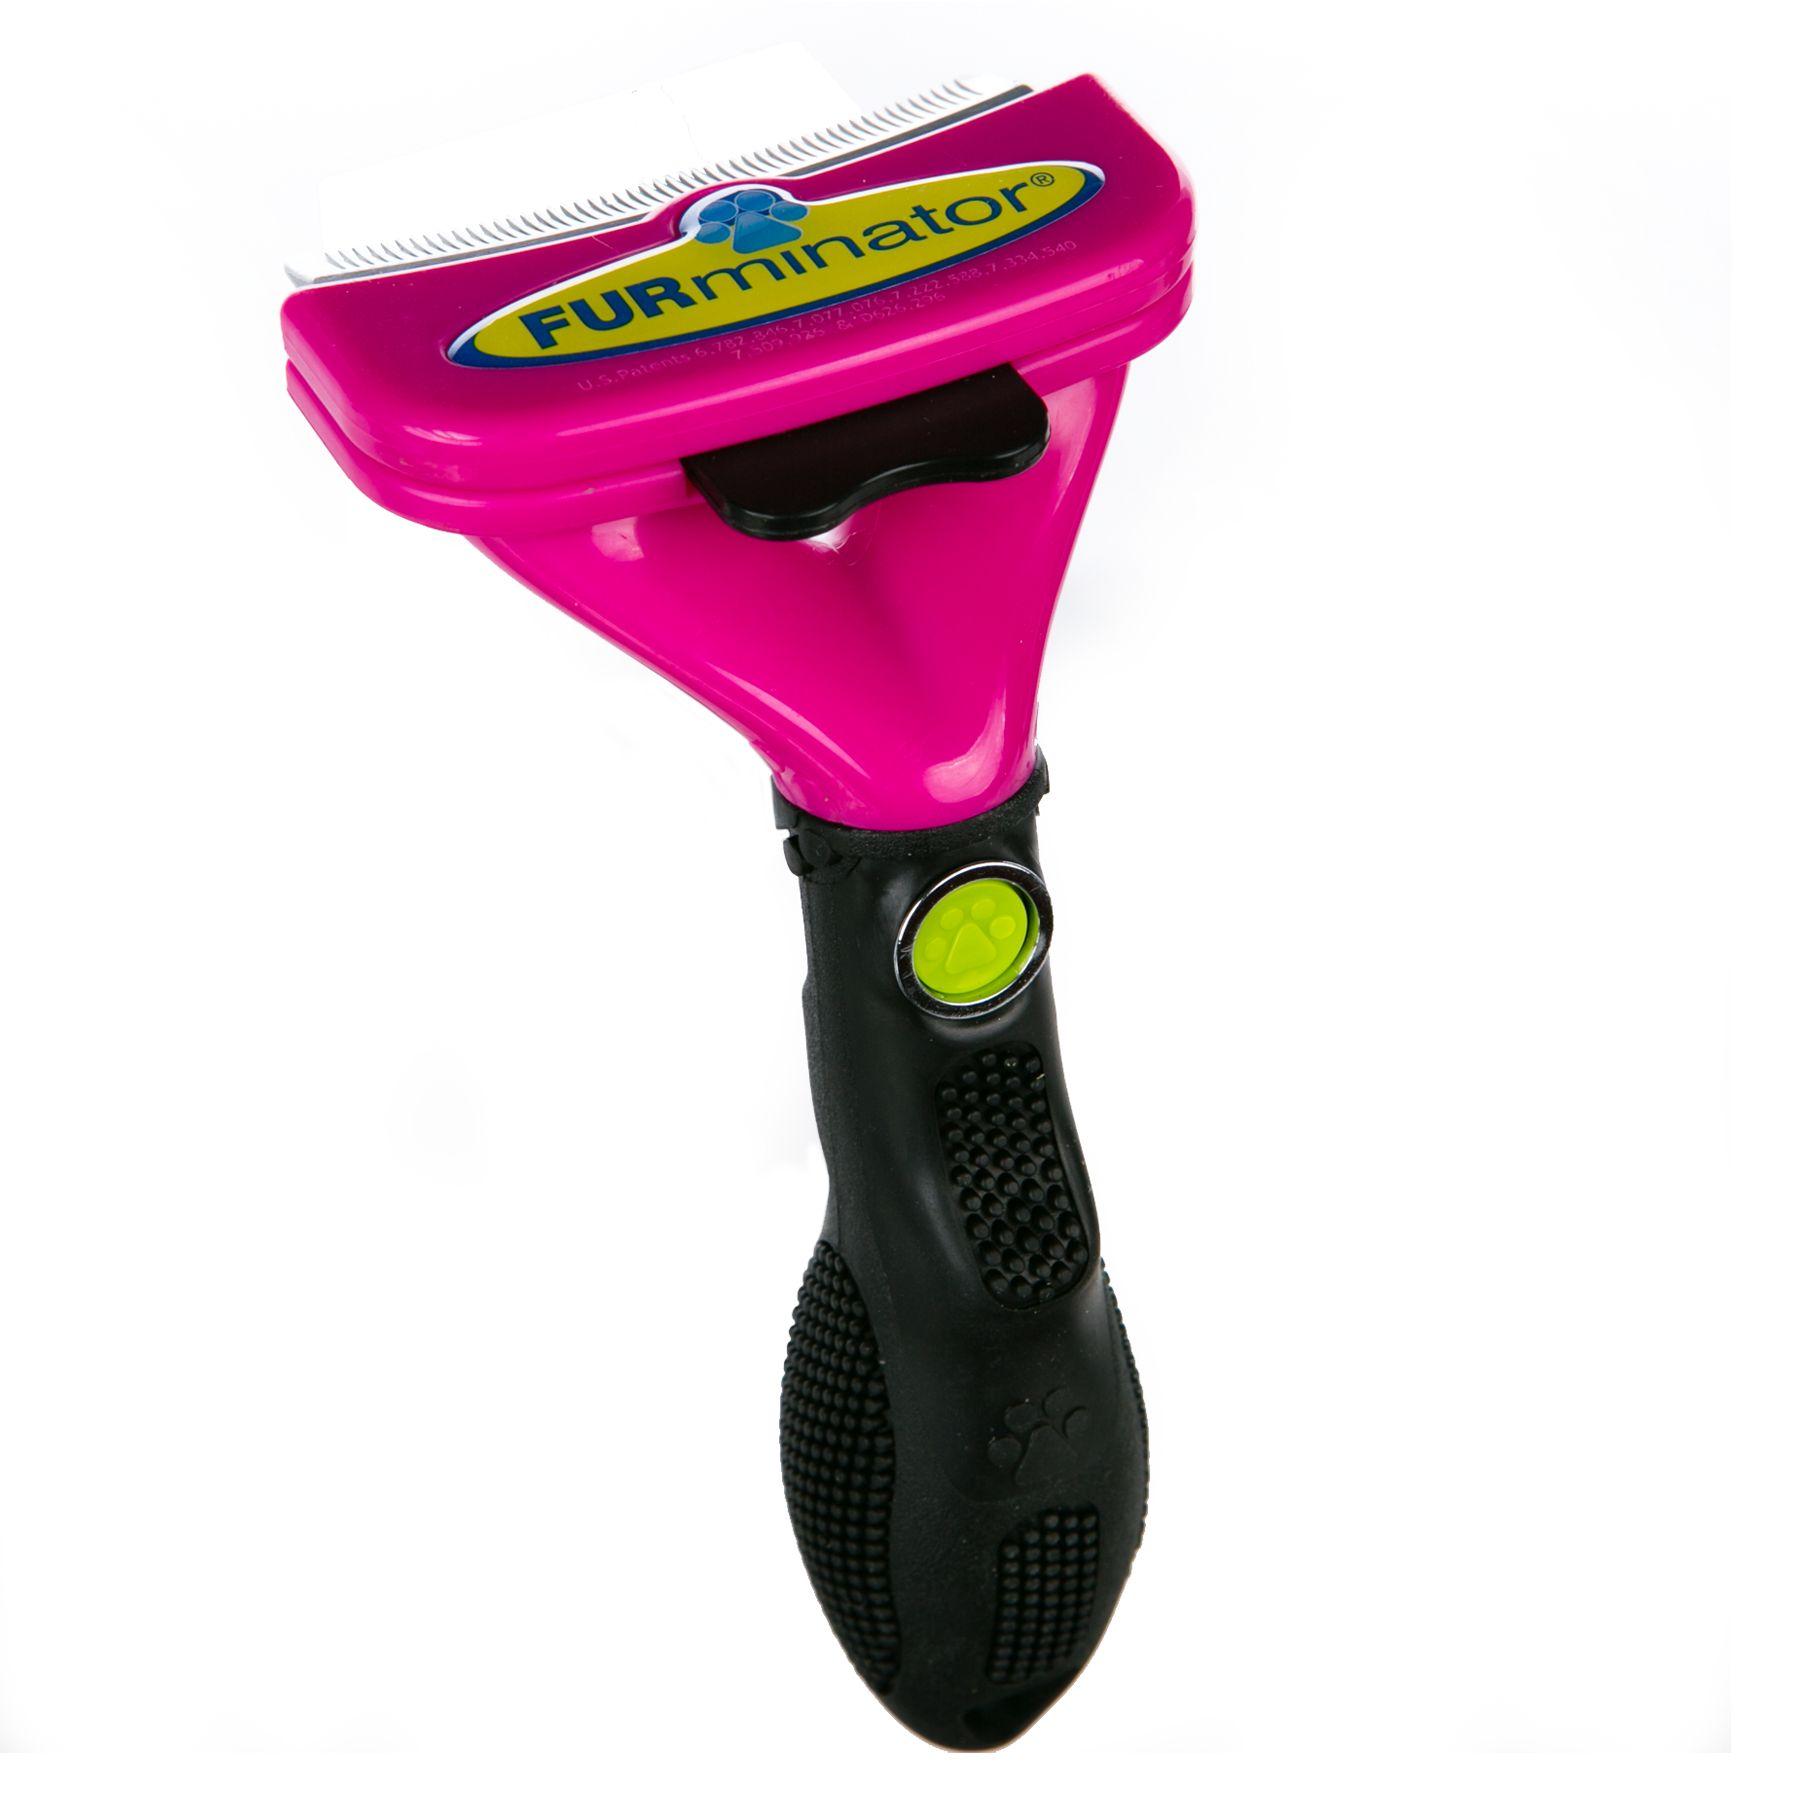 FURminator FURflex, Comfort Edge Contoured deShedding Cat Tool size: Large 5238758